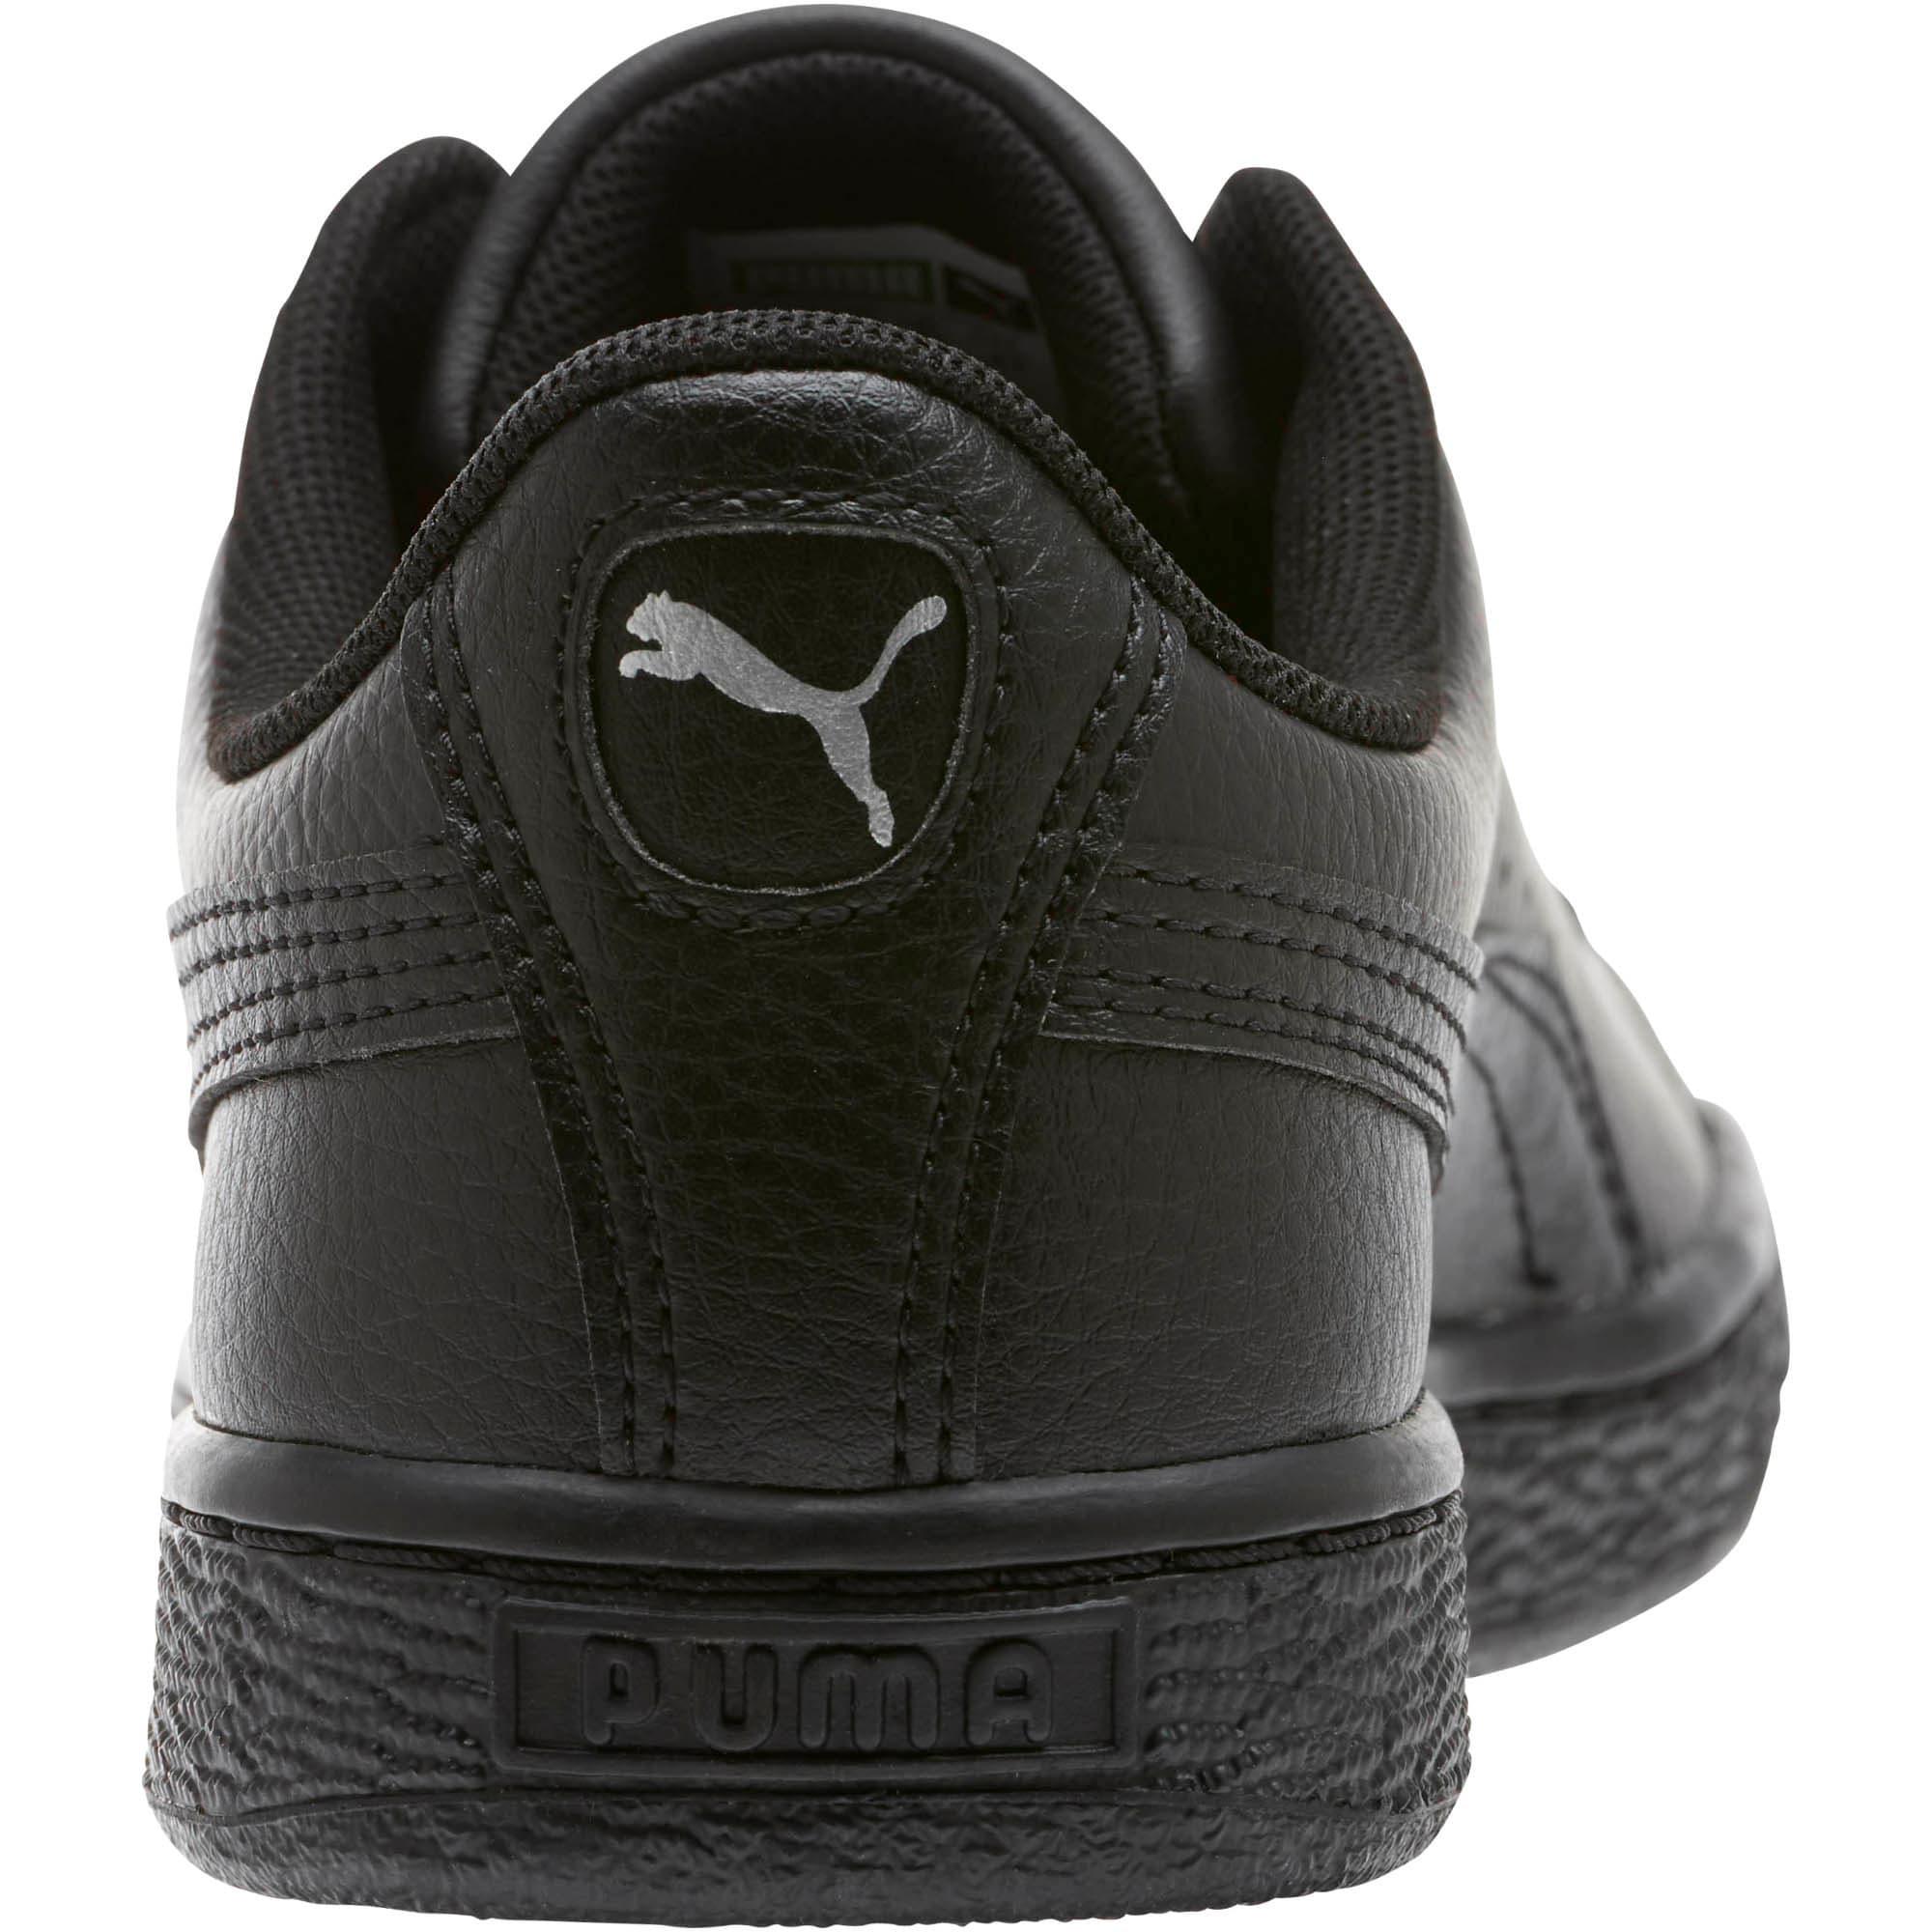 Thumbnail 3 of Basket Classic Sneakers JR, Puma Black-Puma Black, medium